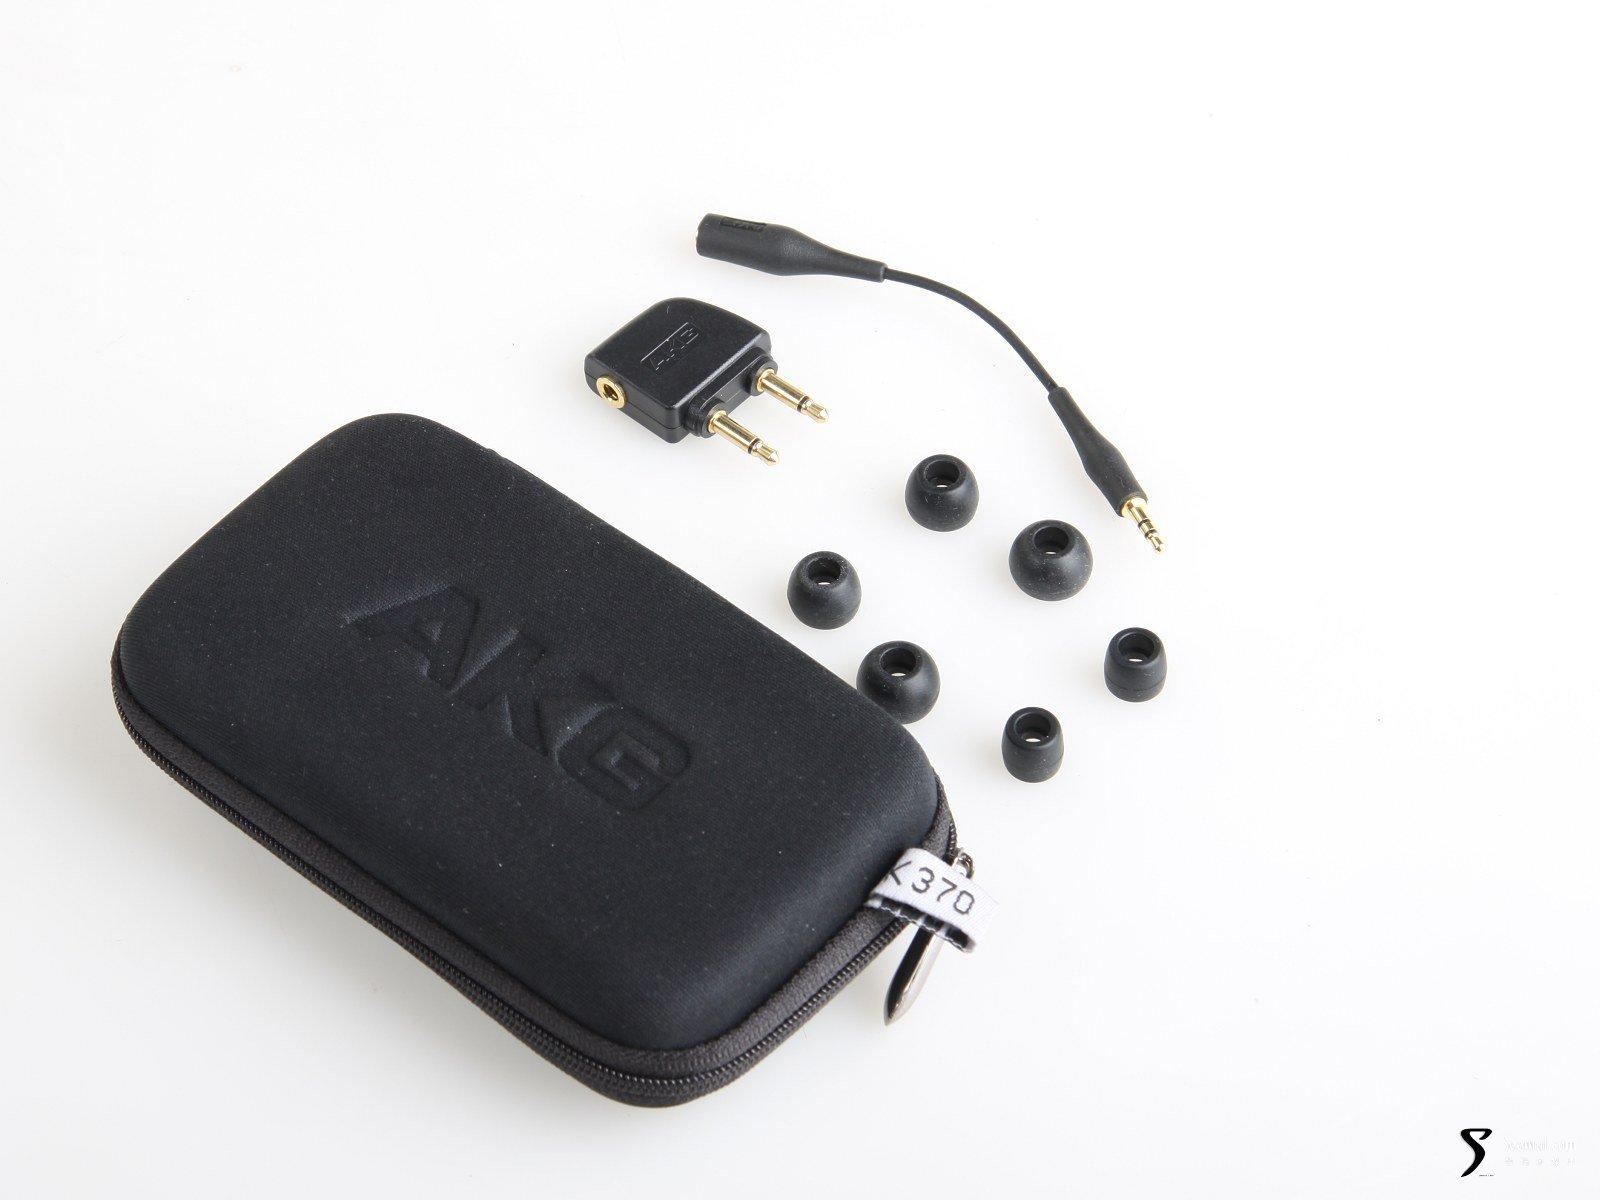 akg k370 入耳式耳机所有附件图片